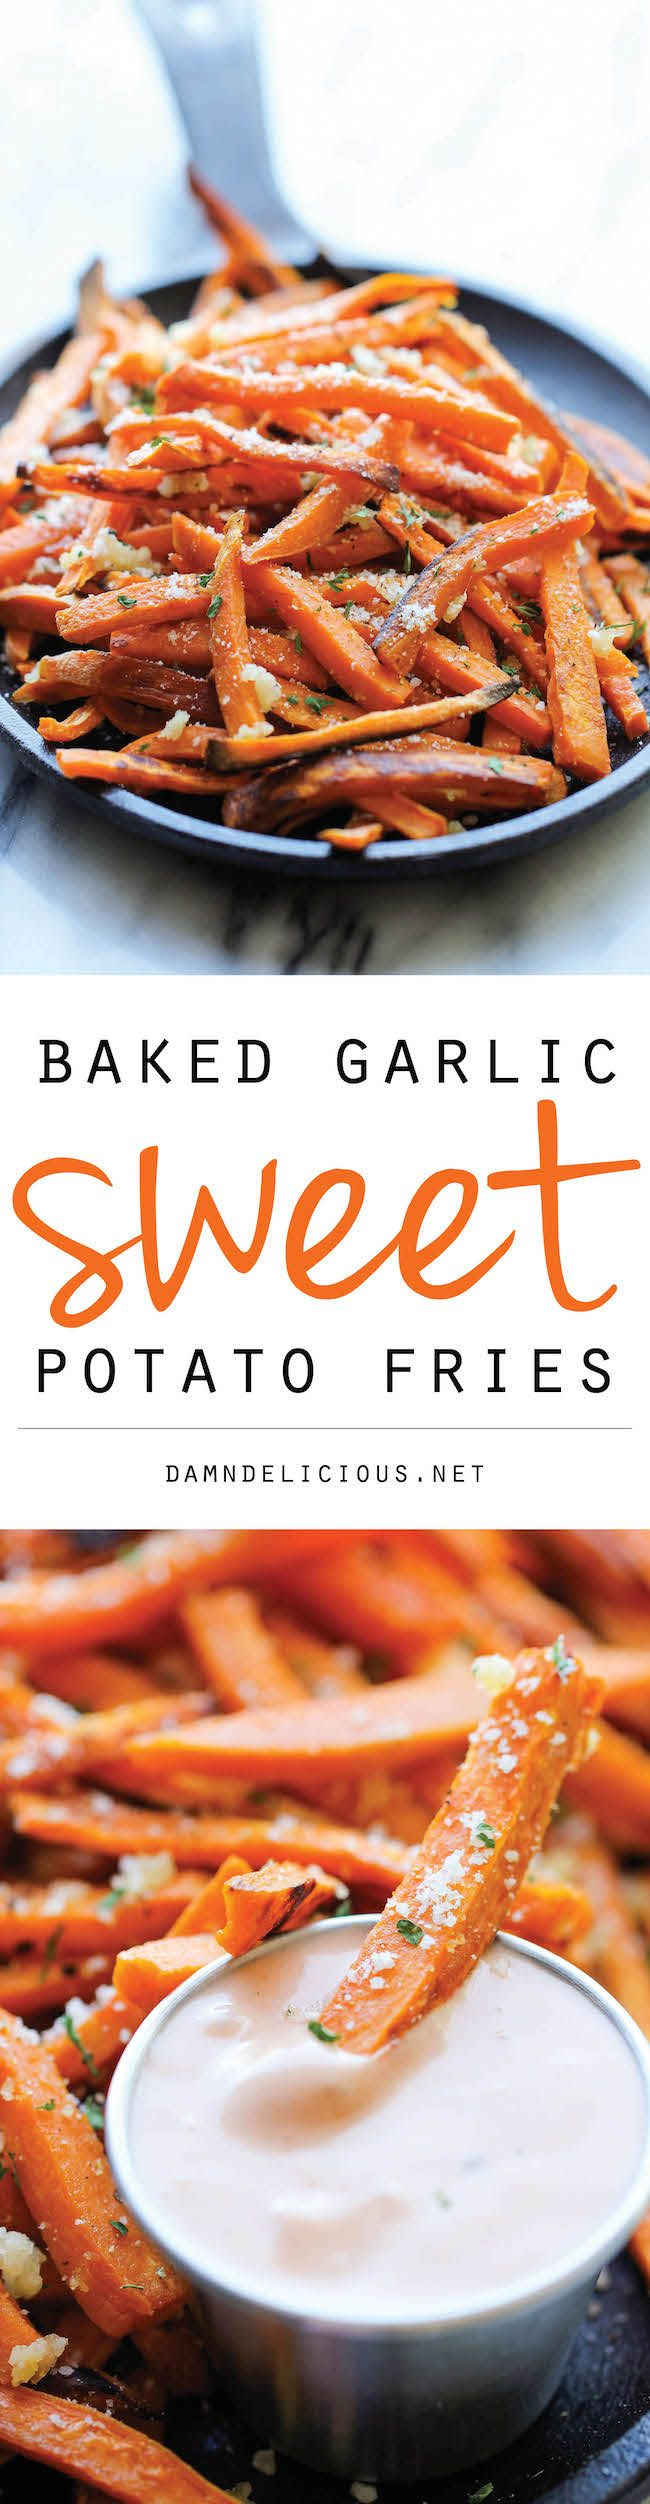 Baked Garlic Sweet Potato Fries #paleo